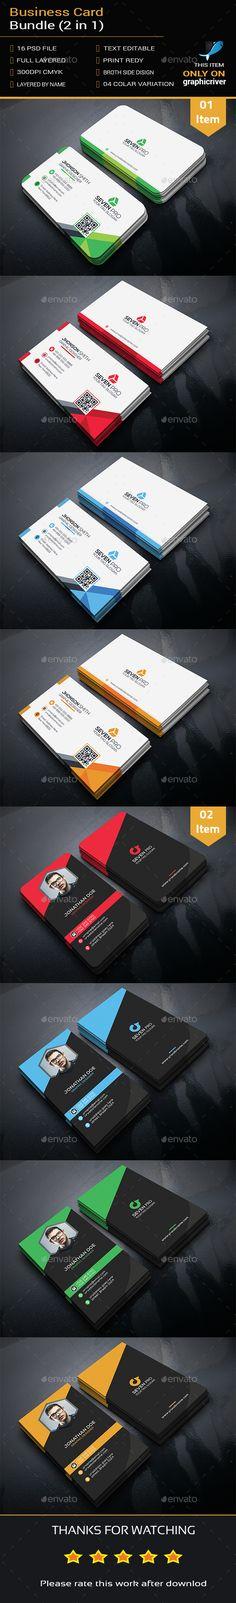 Business Card Template PSD Bundle. Download here: https://graphicriver.net/item/business-card-bundle-2-in-1/17387101?ref=ksioks